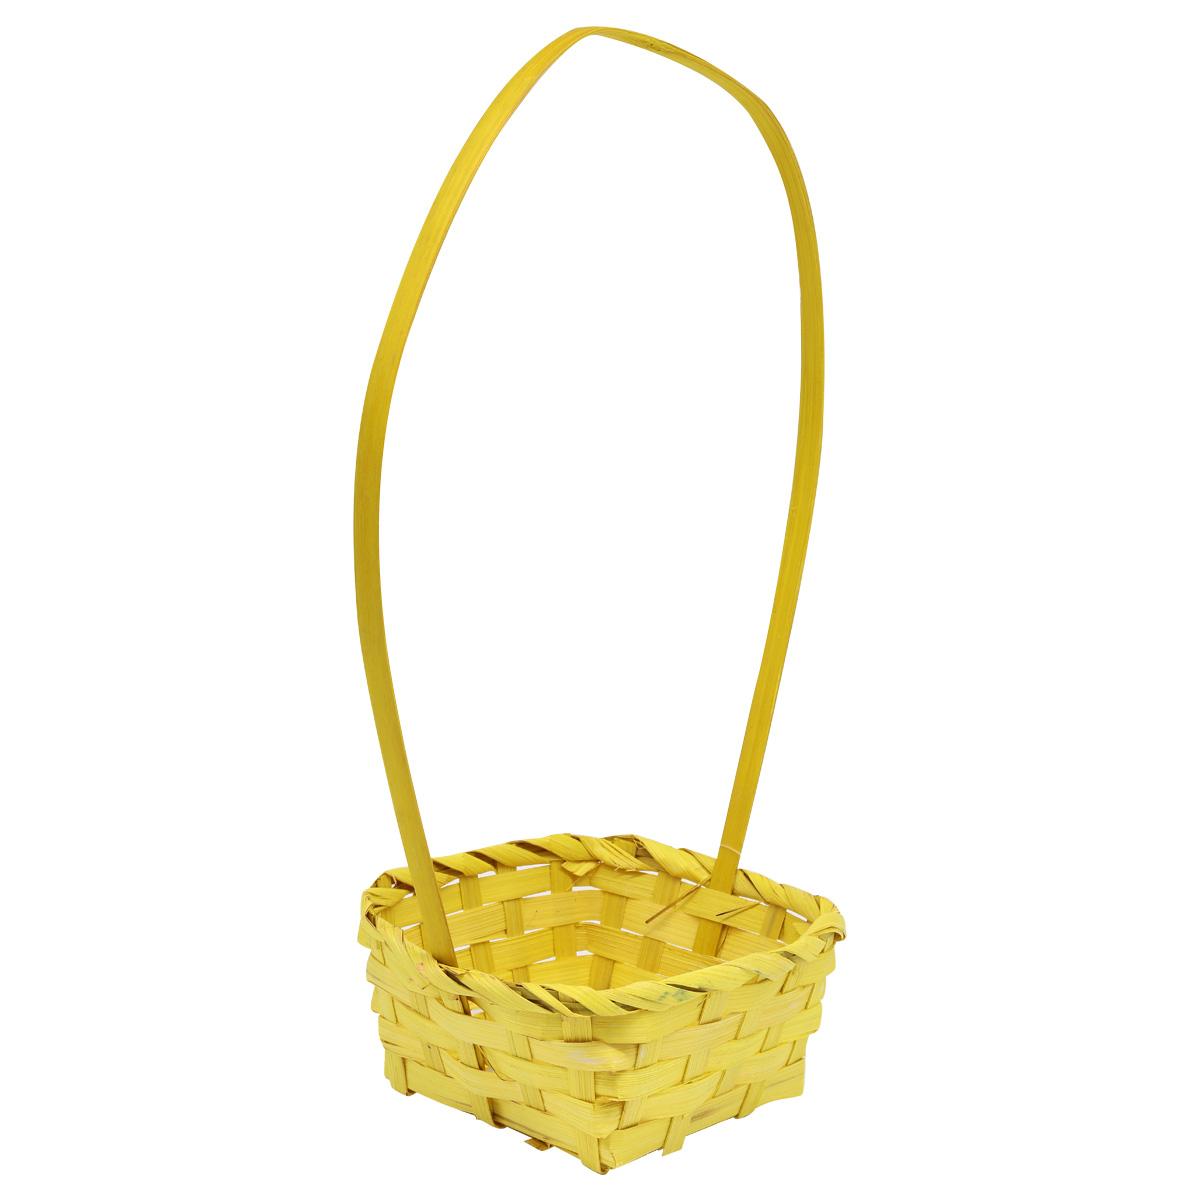 19HJ19083 Корзина плетеная бамбук 13*13*6,5*Н25,5см, цв. желтый Астра